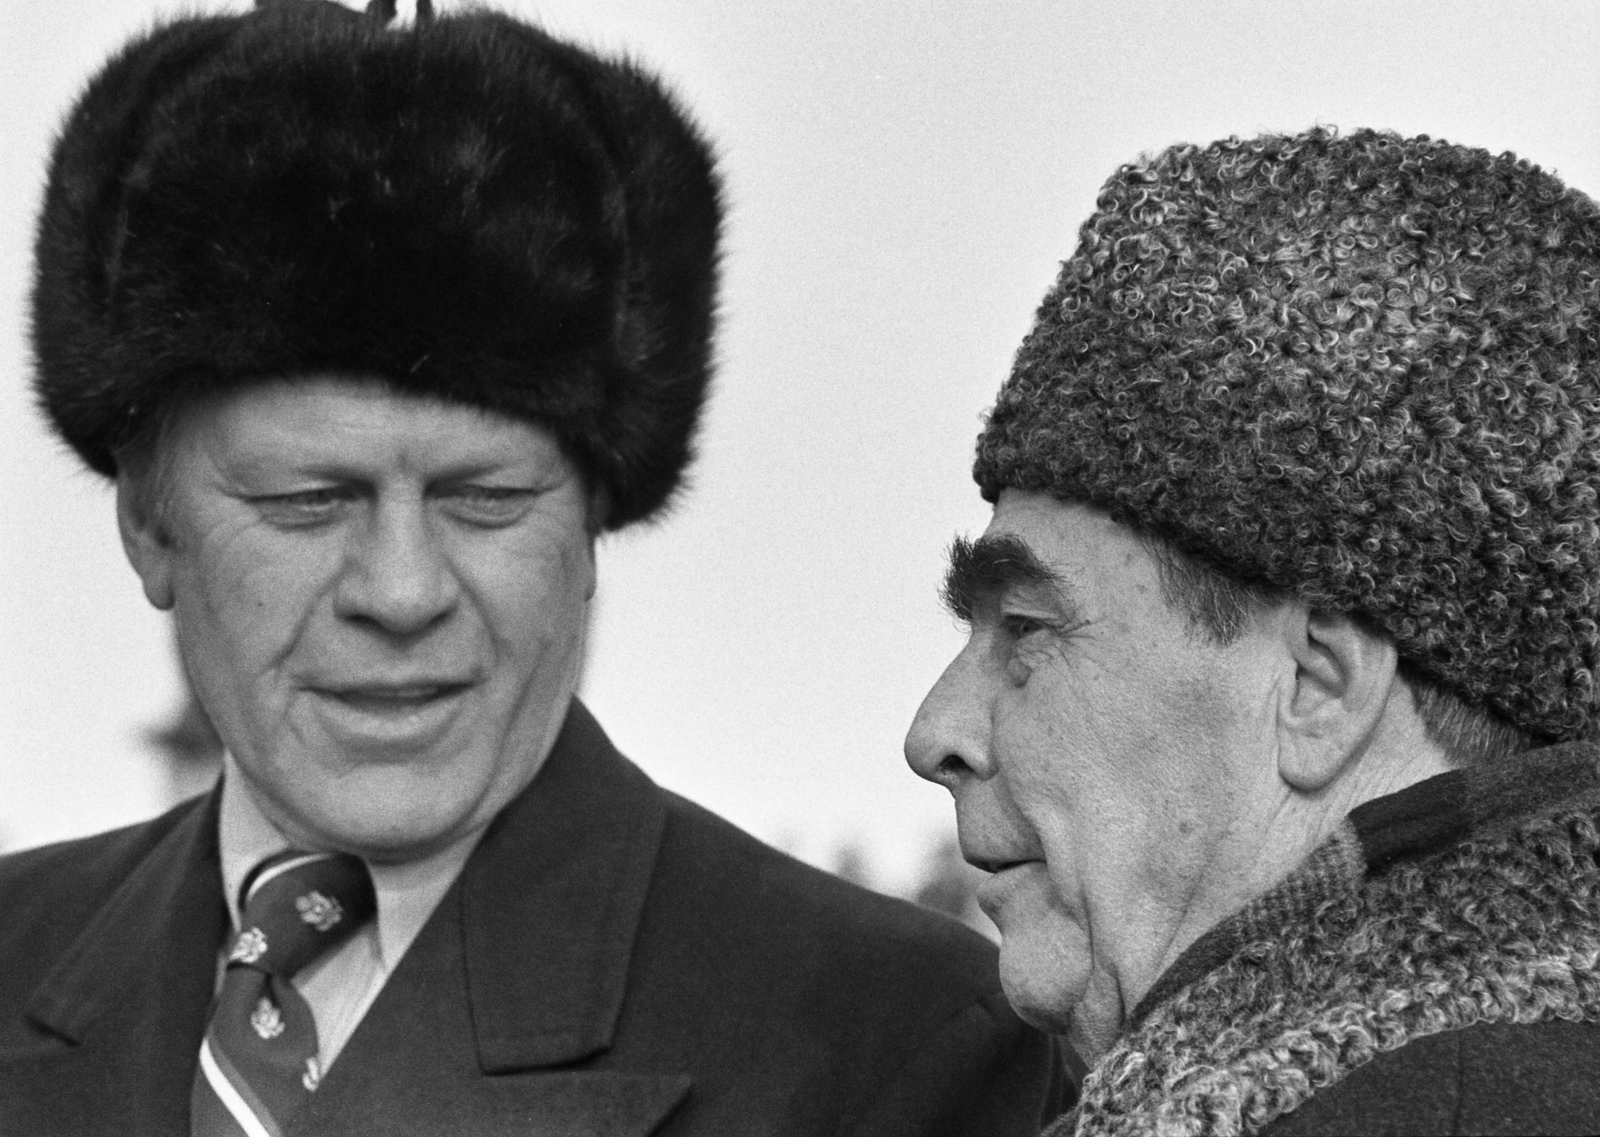 Photograph of President Gerald Ford with Soviet General Secretary Leonid Brezhnev upon Ford's Arrival at Vozdvizhenka Air Base, near Vladivostok, U.S.S.R.